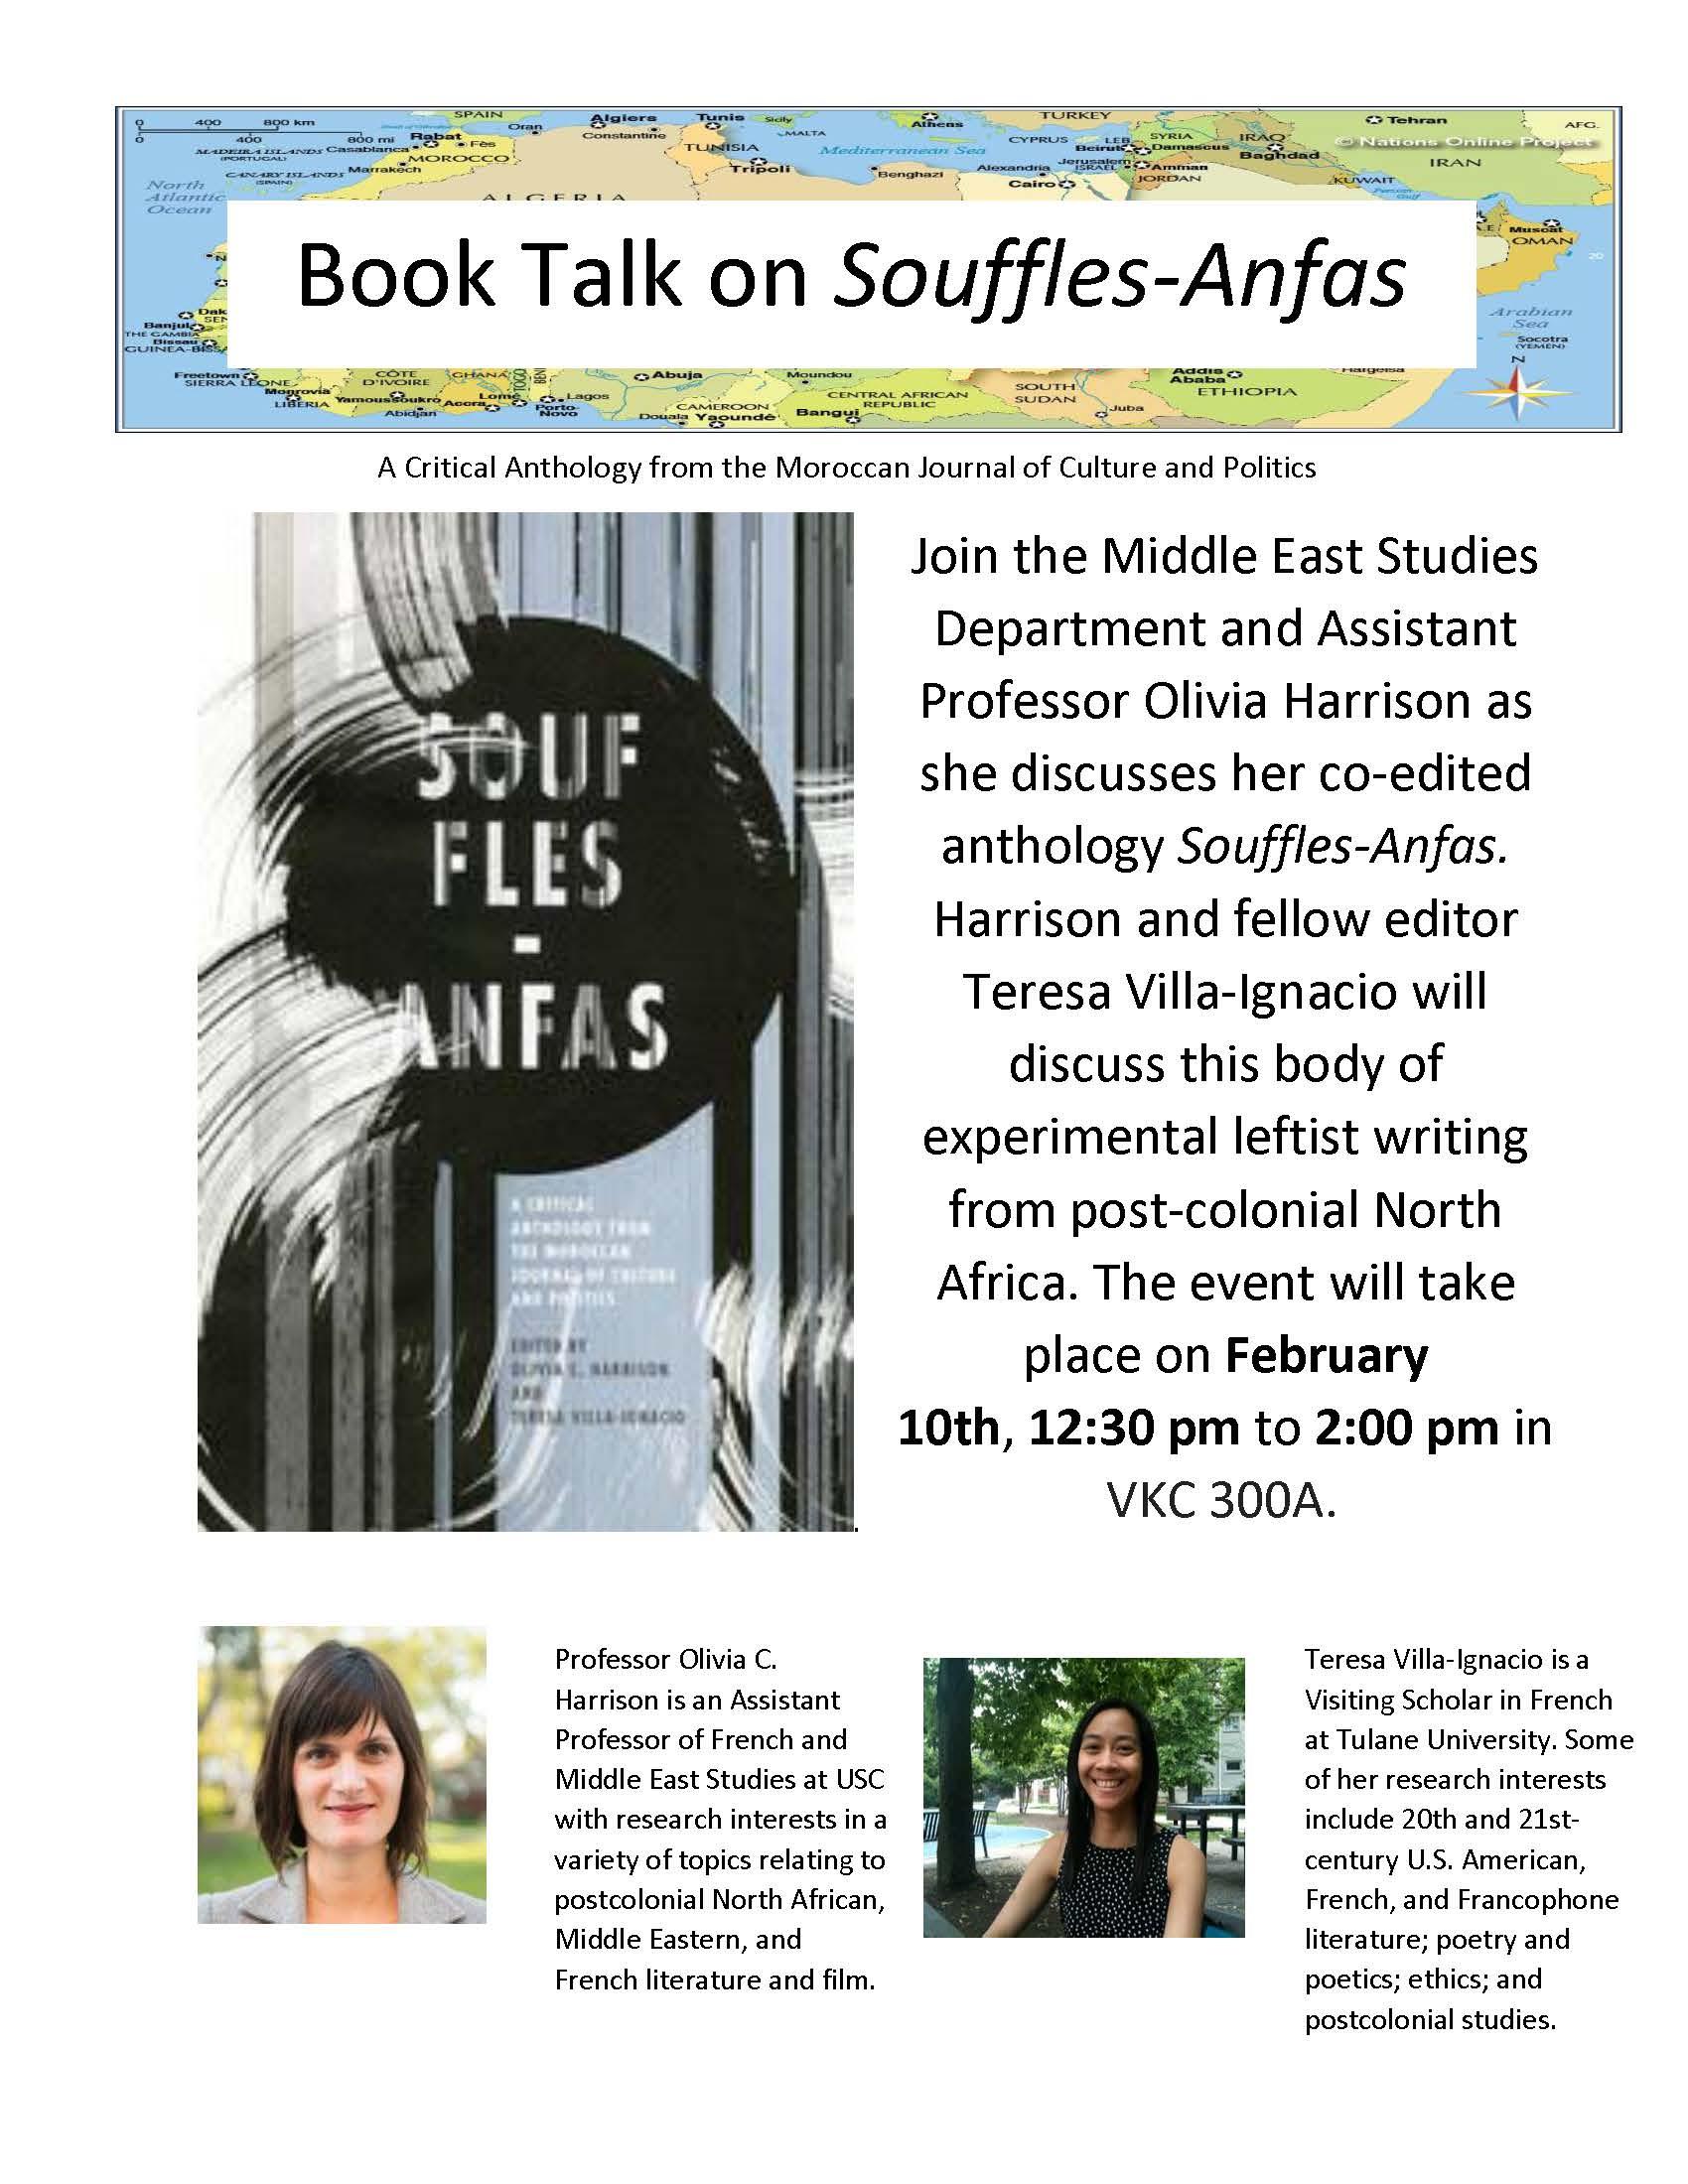 Book Talk: Souffles-Anfas